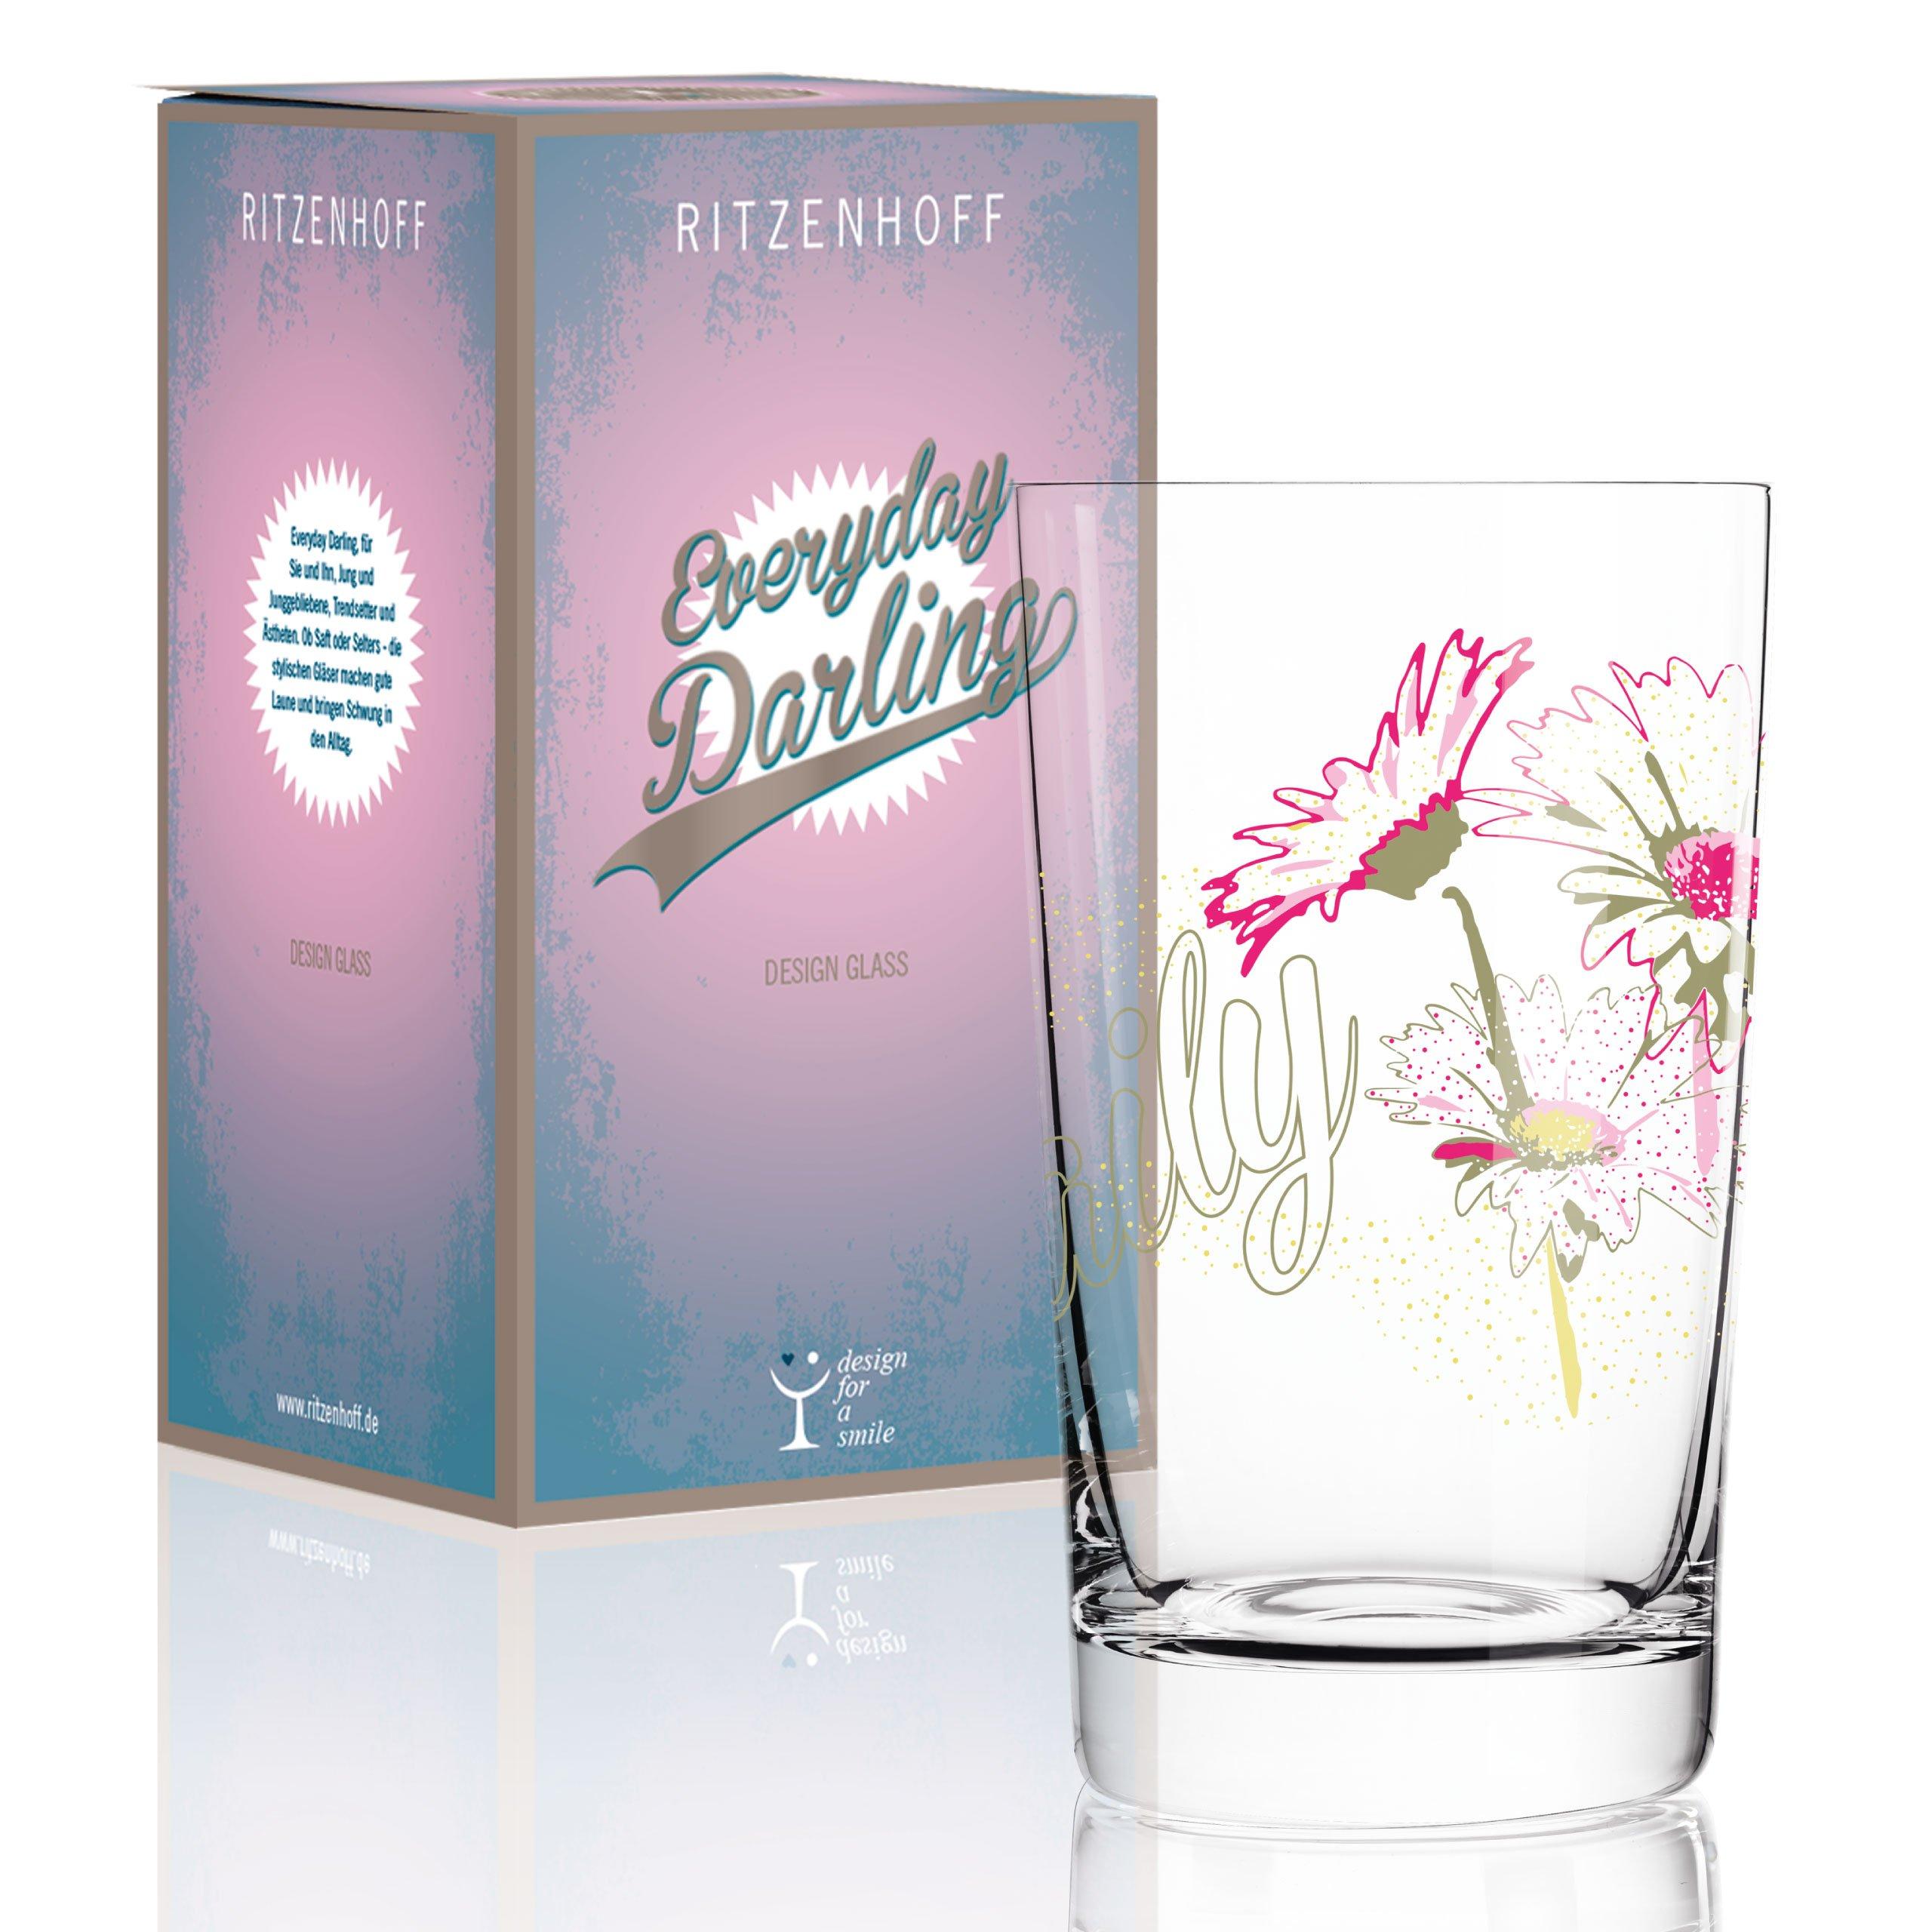 Ritzenhoff 3270012Everyday Darling Softdrinkglas, 7.3x 7.3x 5cm Multicoloured